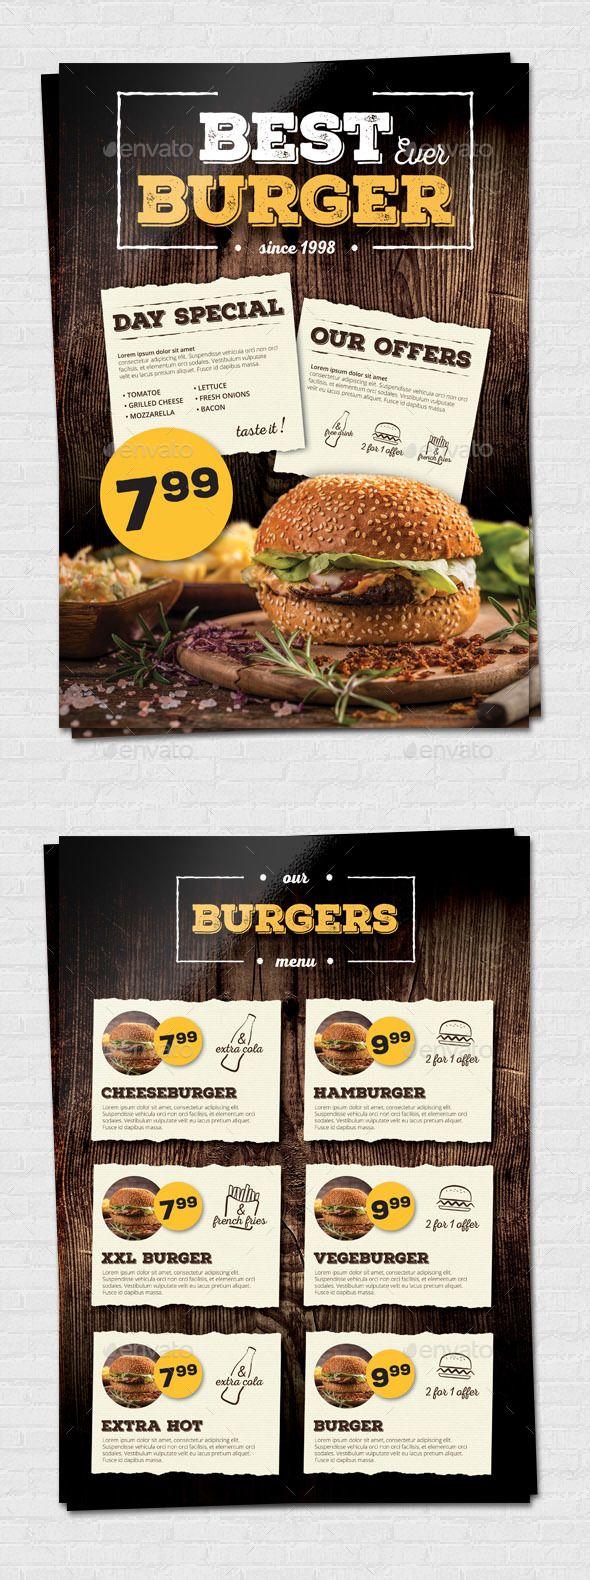 Fast Food Restaurant Menu - Food Menus Print Templates Download here : https://graphicriver.net/item/fast-food-restaurant-menu/19164433?s_rank=120&ref=Al-fatih